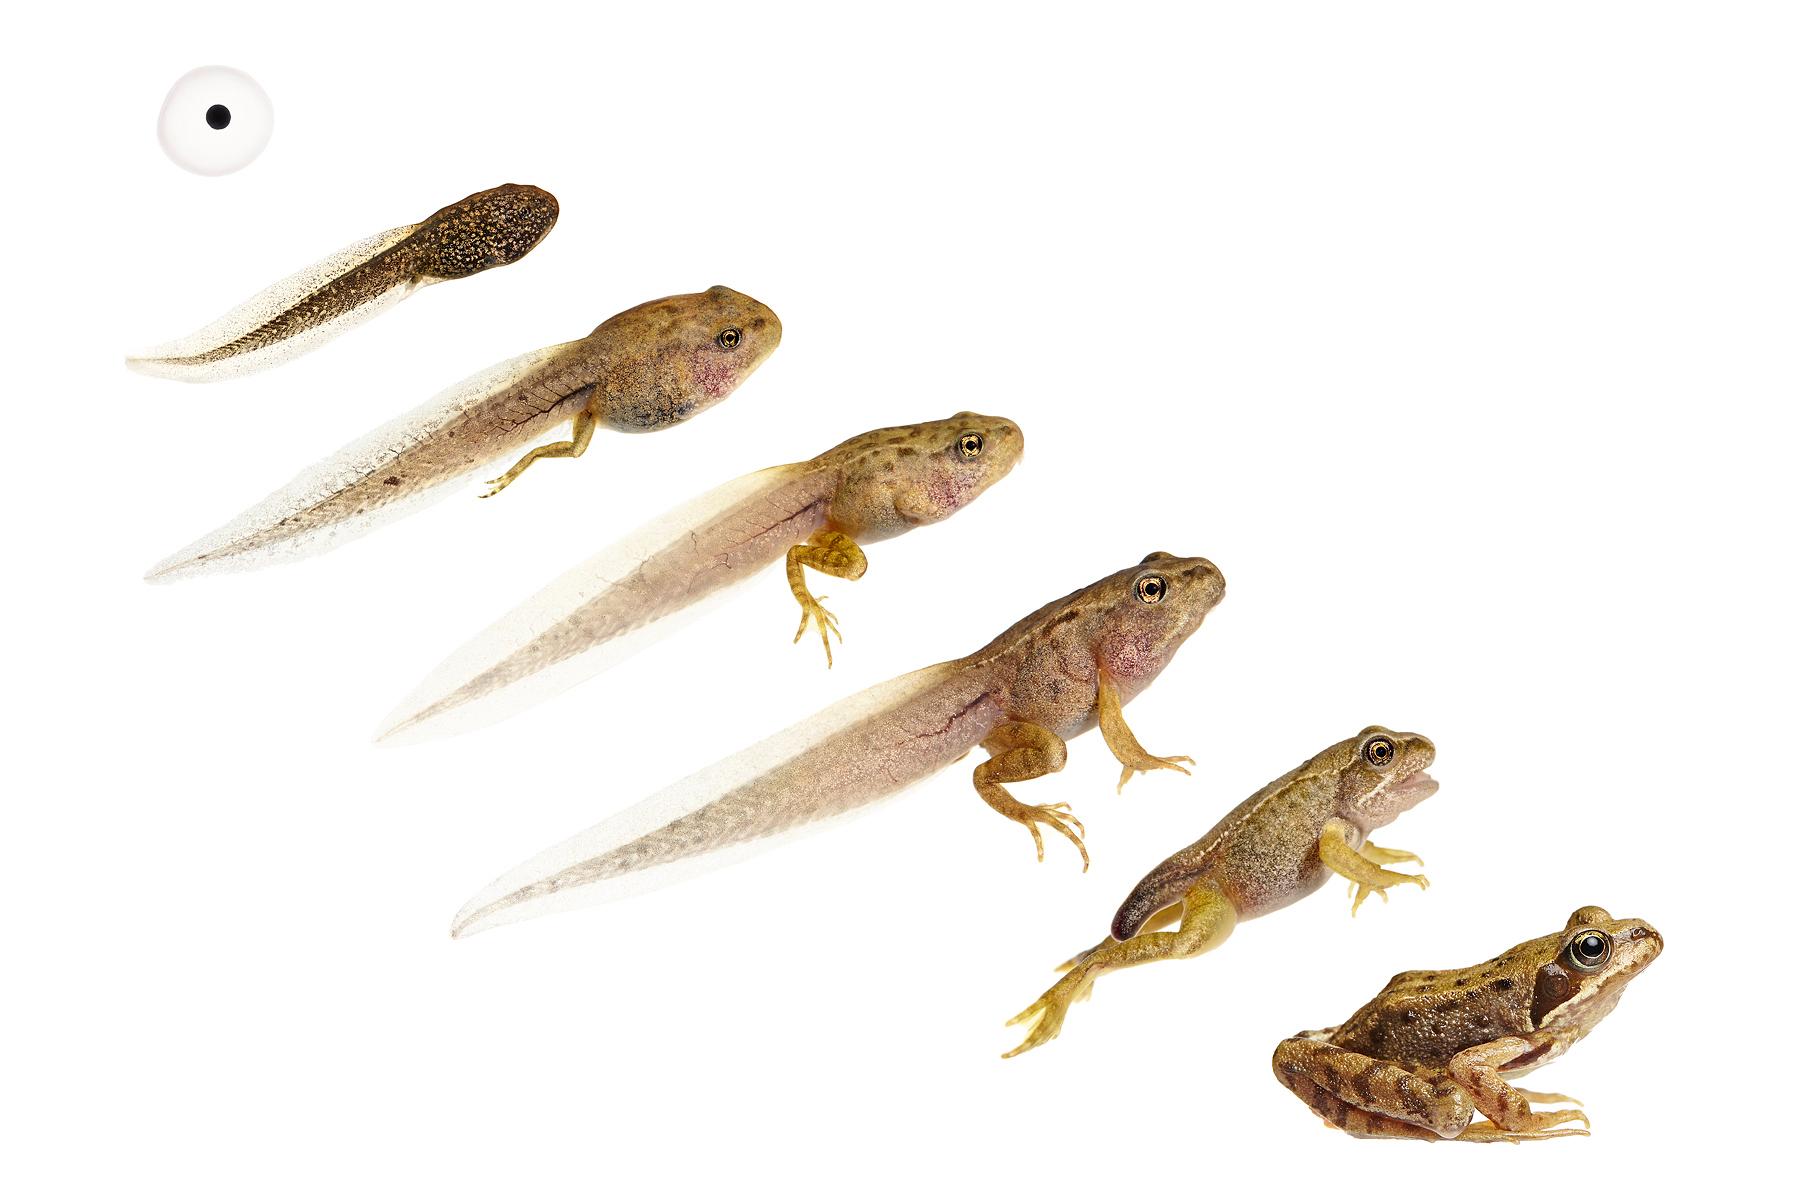 0001_Frog Life Cycle-1.jpg